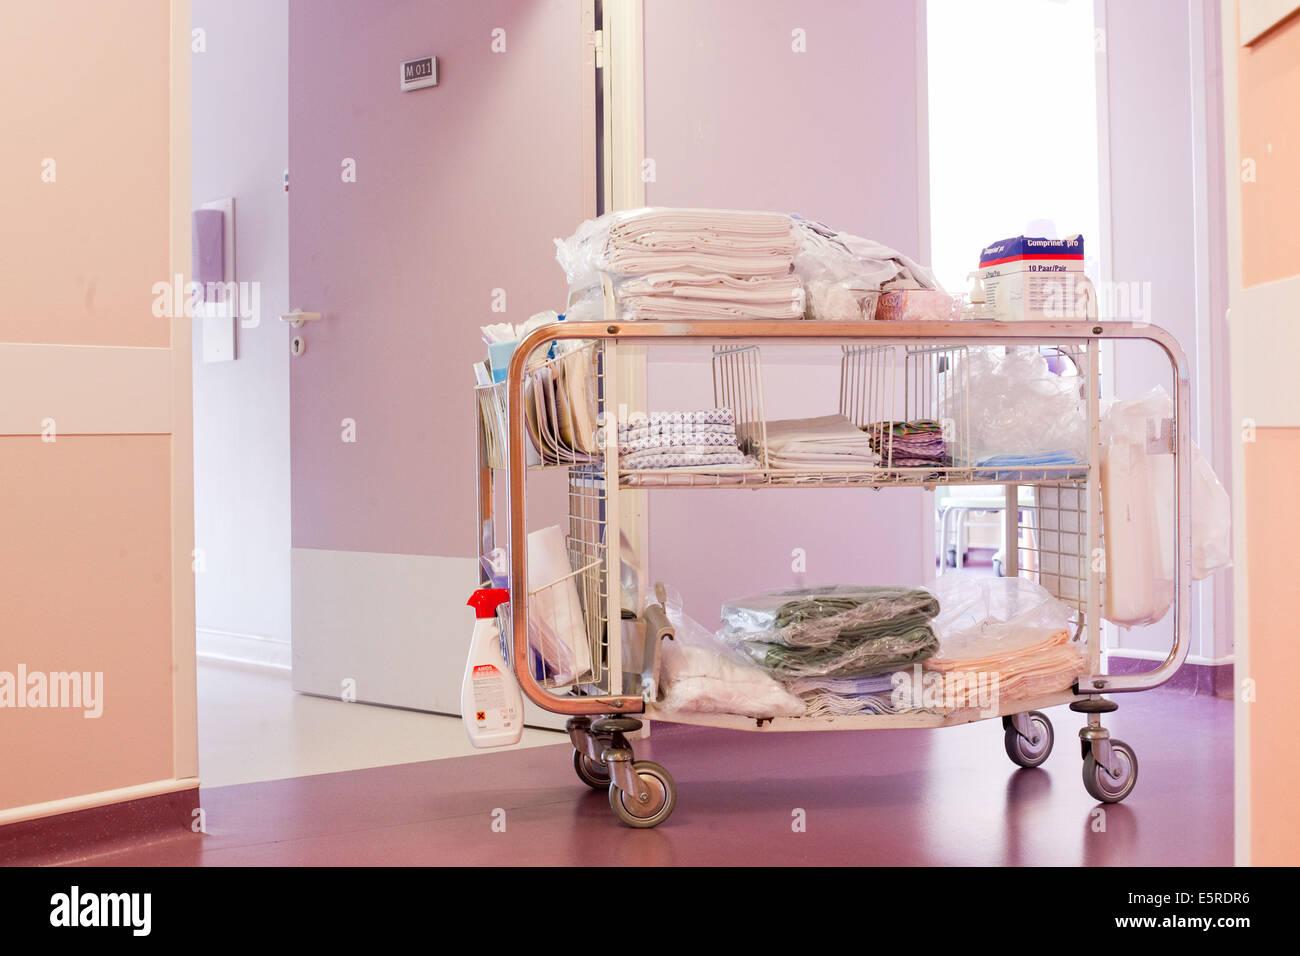 Gynaecology Emergency Room